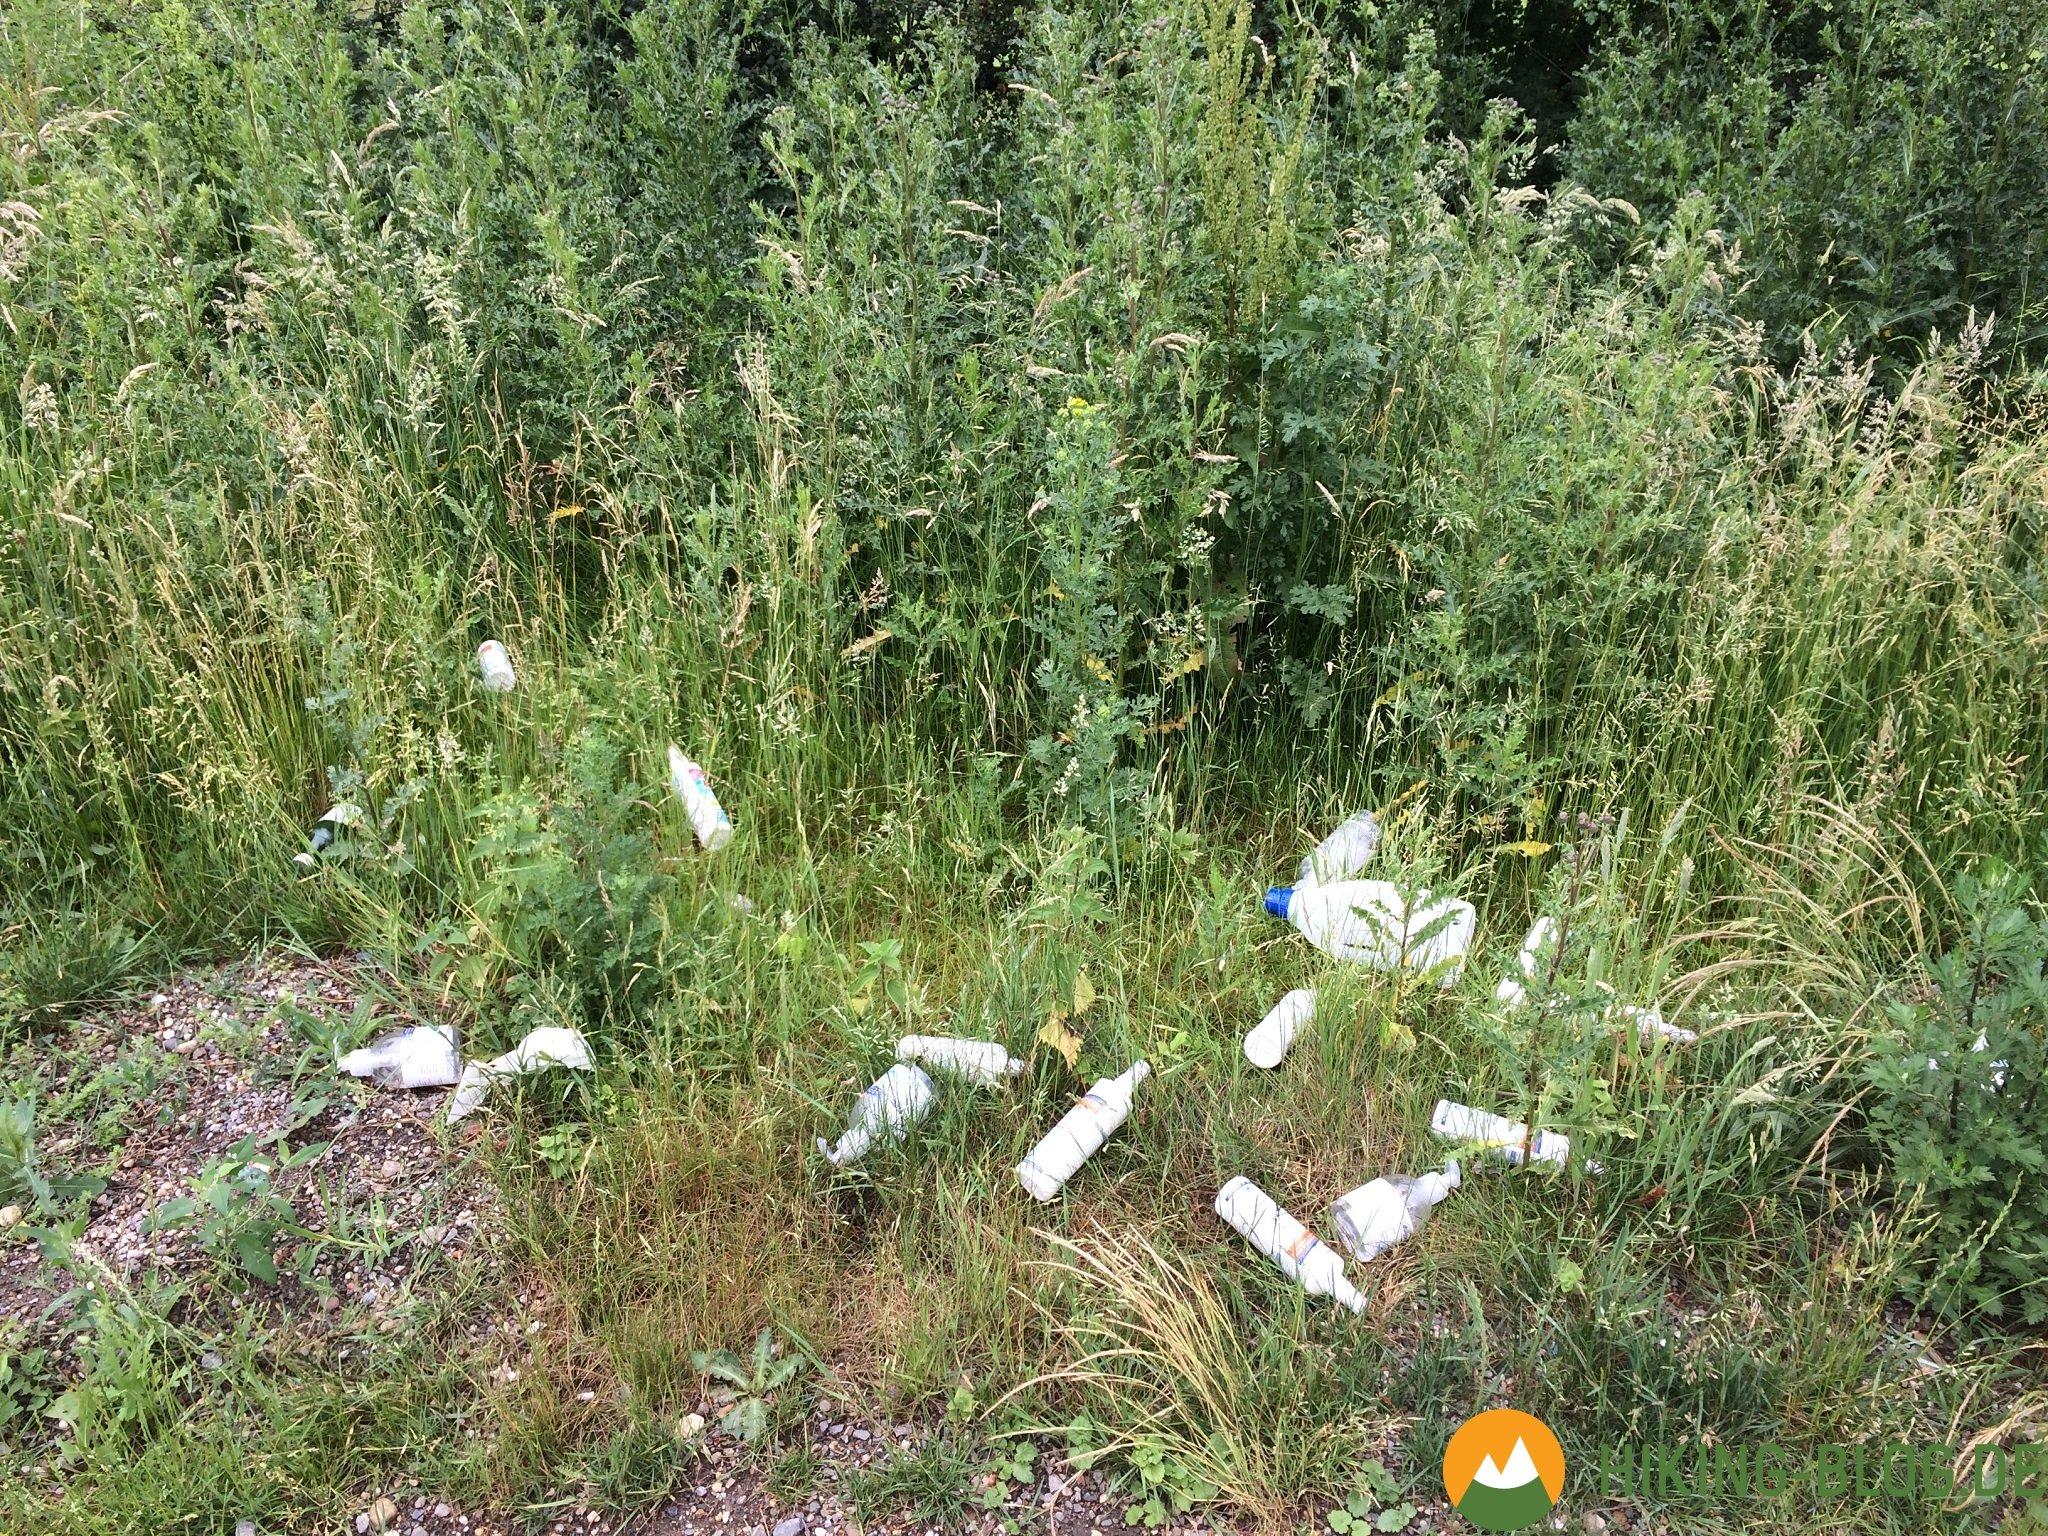 Illegal in der Natur entsorgter Müll